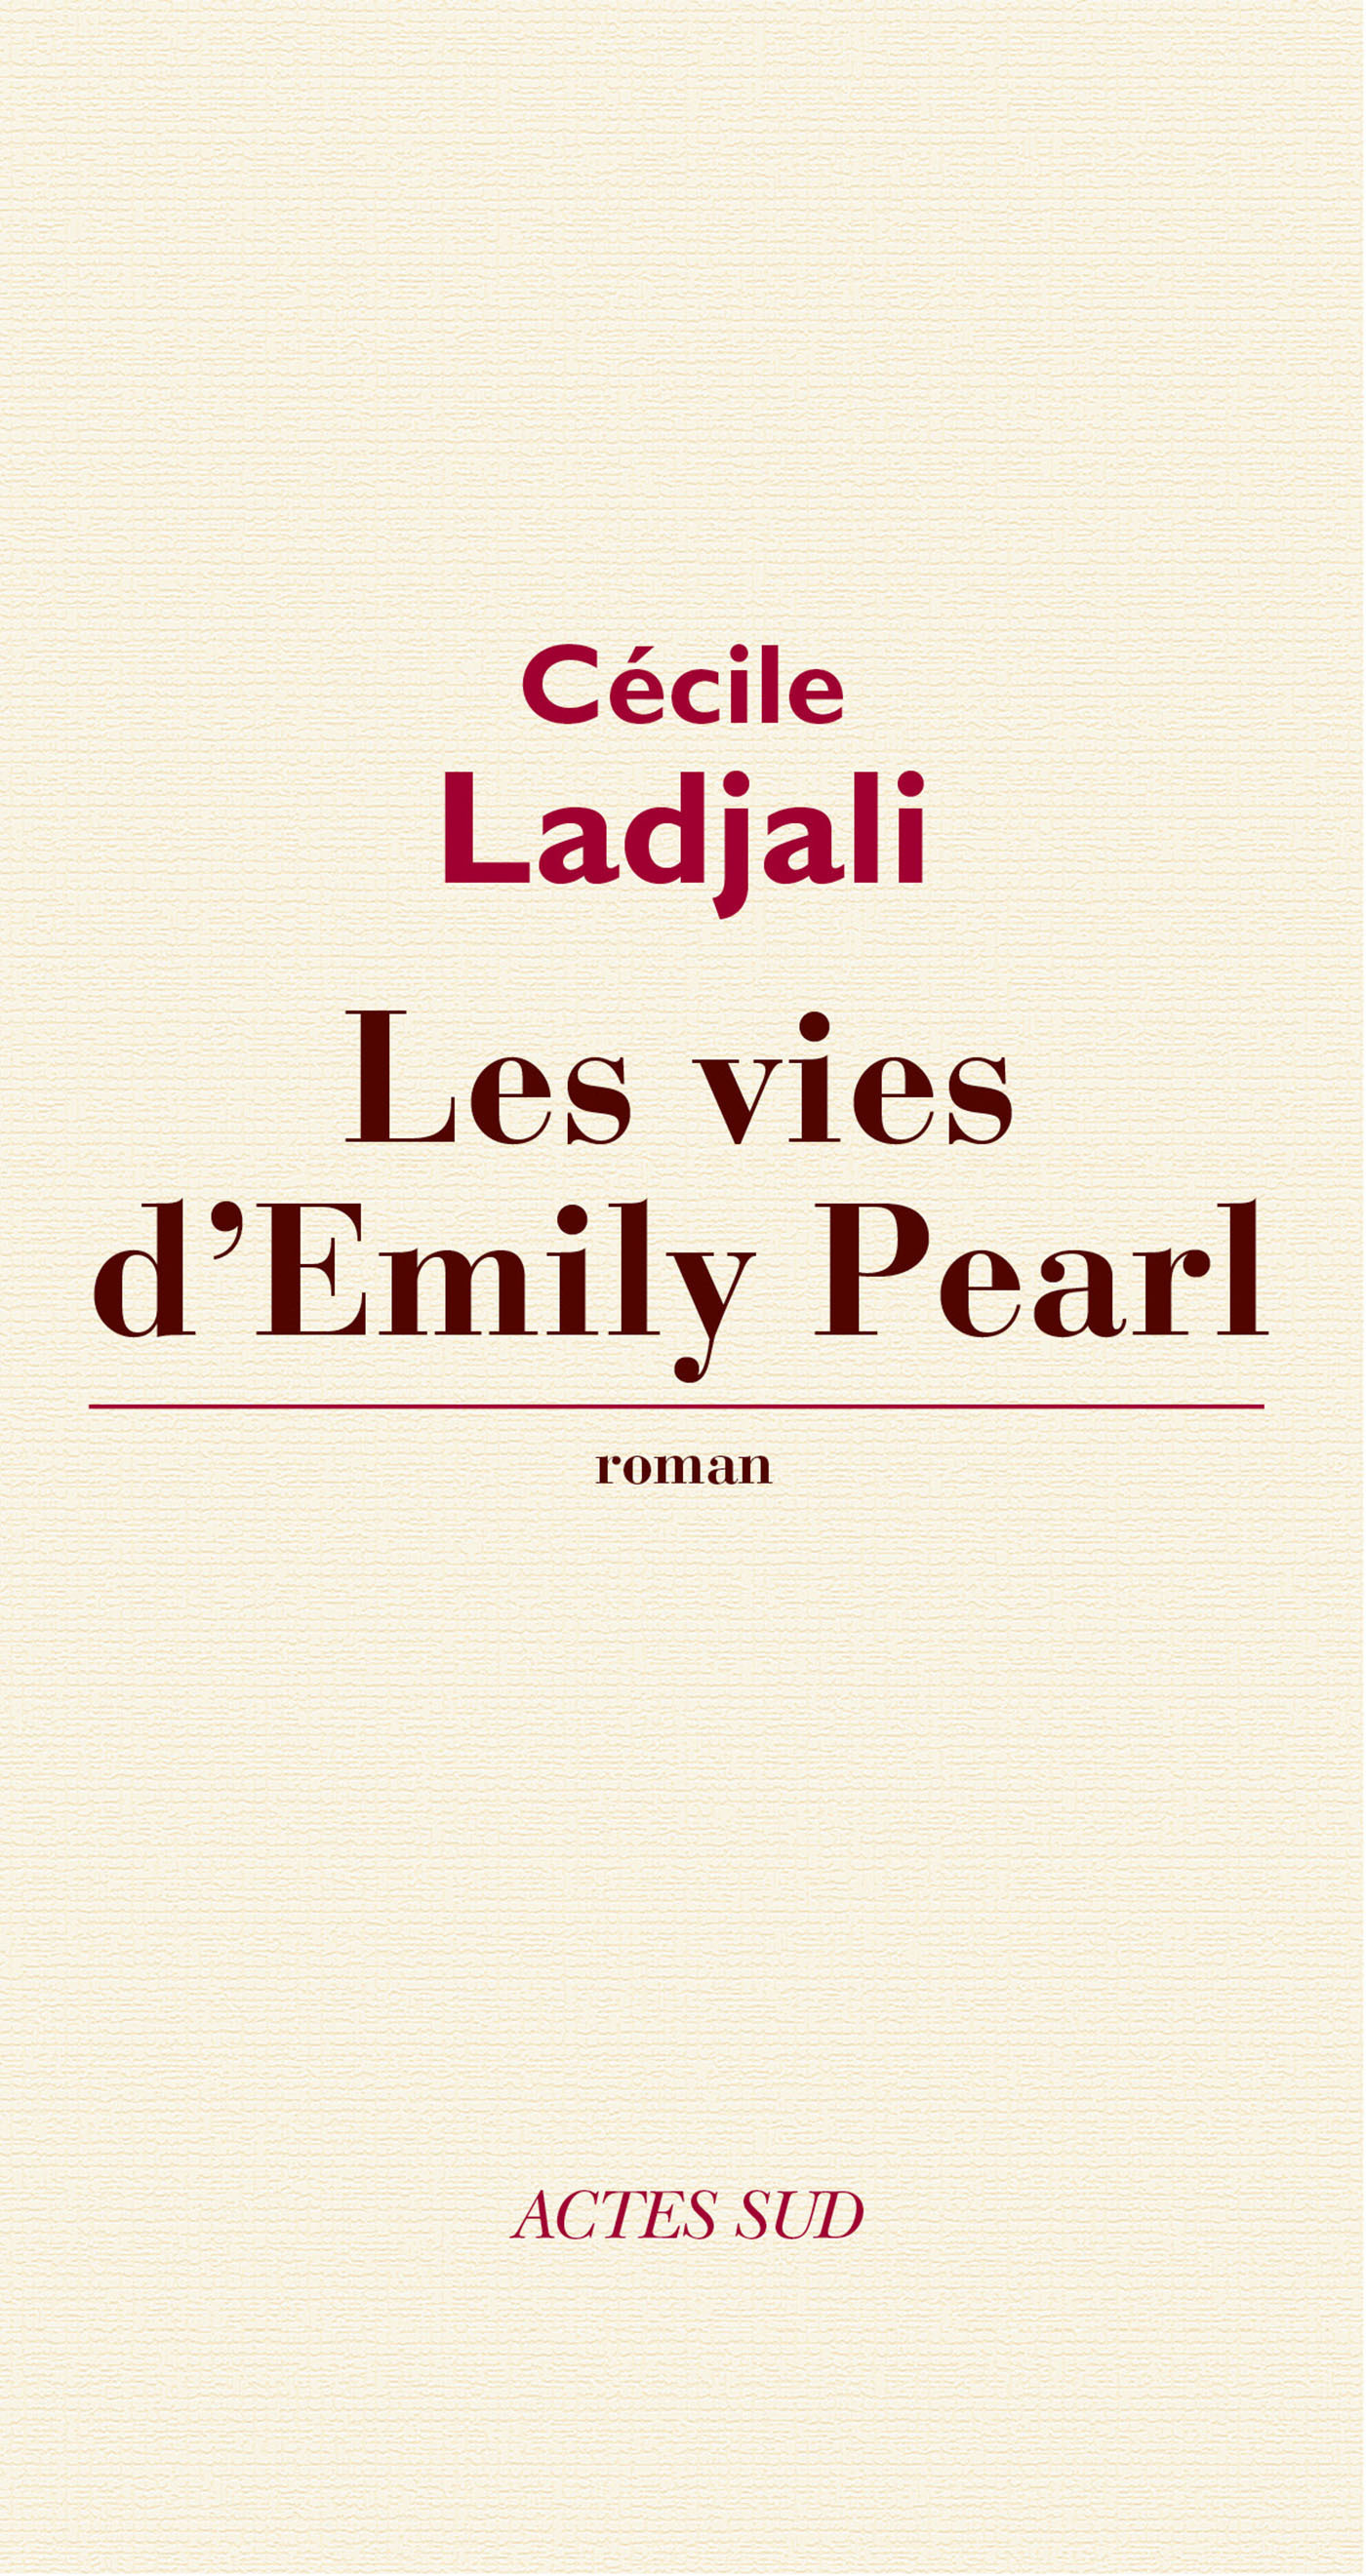 Les Vies d'Emily Pearl